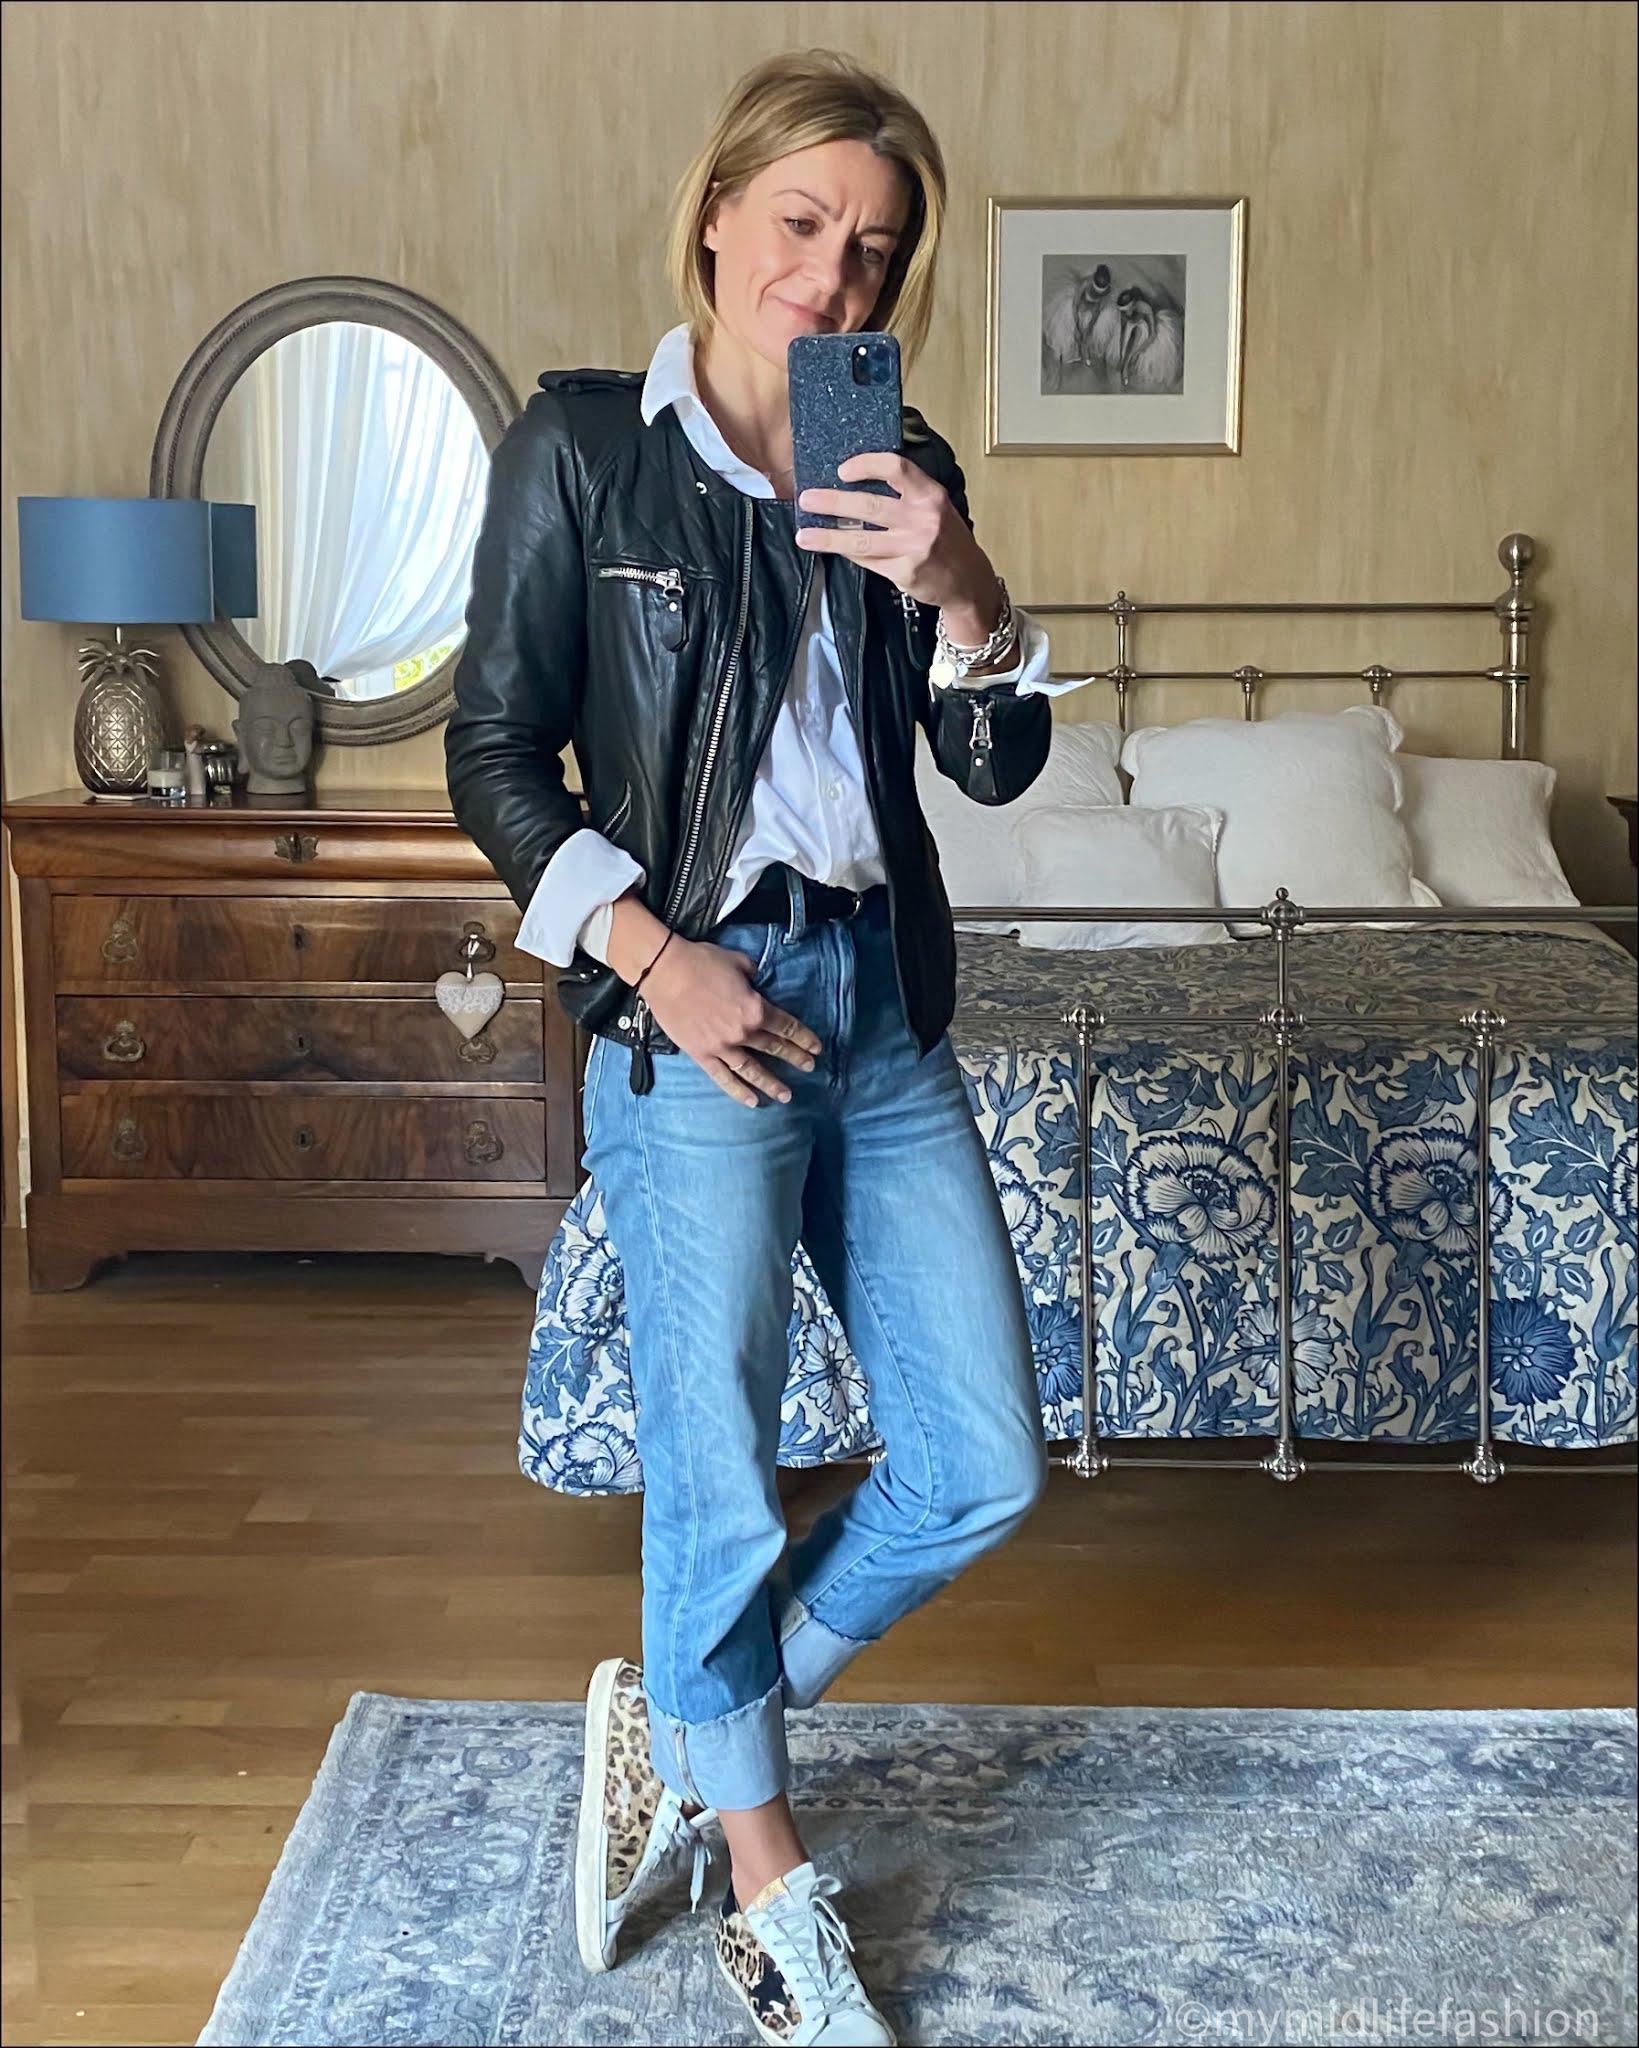 my midlife fashion, Isabel Marant Etoile leather jacket, baukjen heather cotton shirt, Isabel Marant studded belt, j crew boyfriend turn up jeans, golden goose superstar low top leather trainers